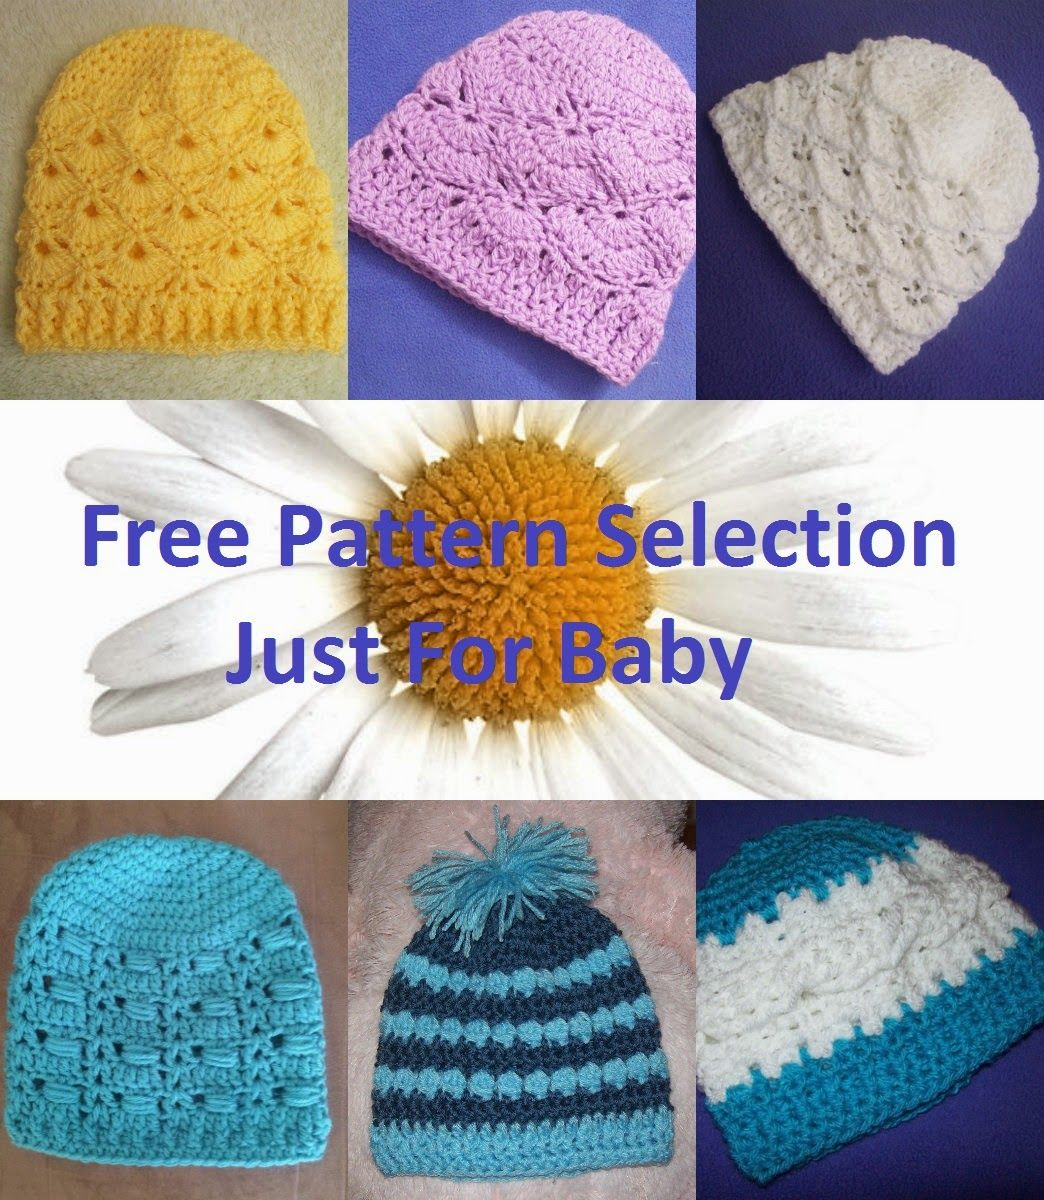 Free Crochet Hat Patterns Just For Baby | Häkelmützenmuster ...